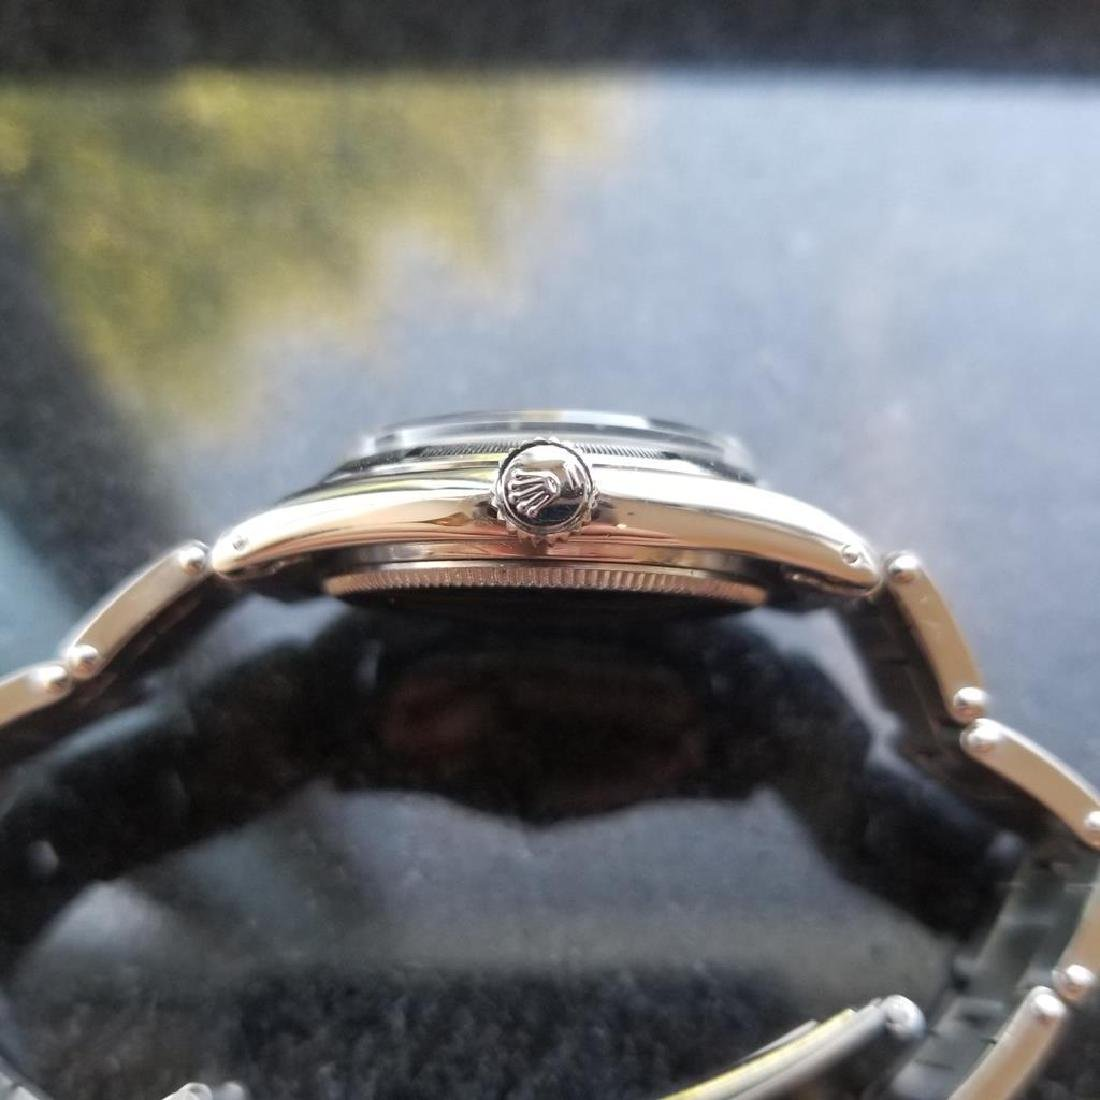 ROLEX Men's Midsize Rolex Oyster Perpetual 6549 - 4